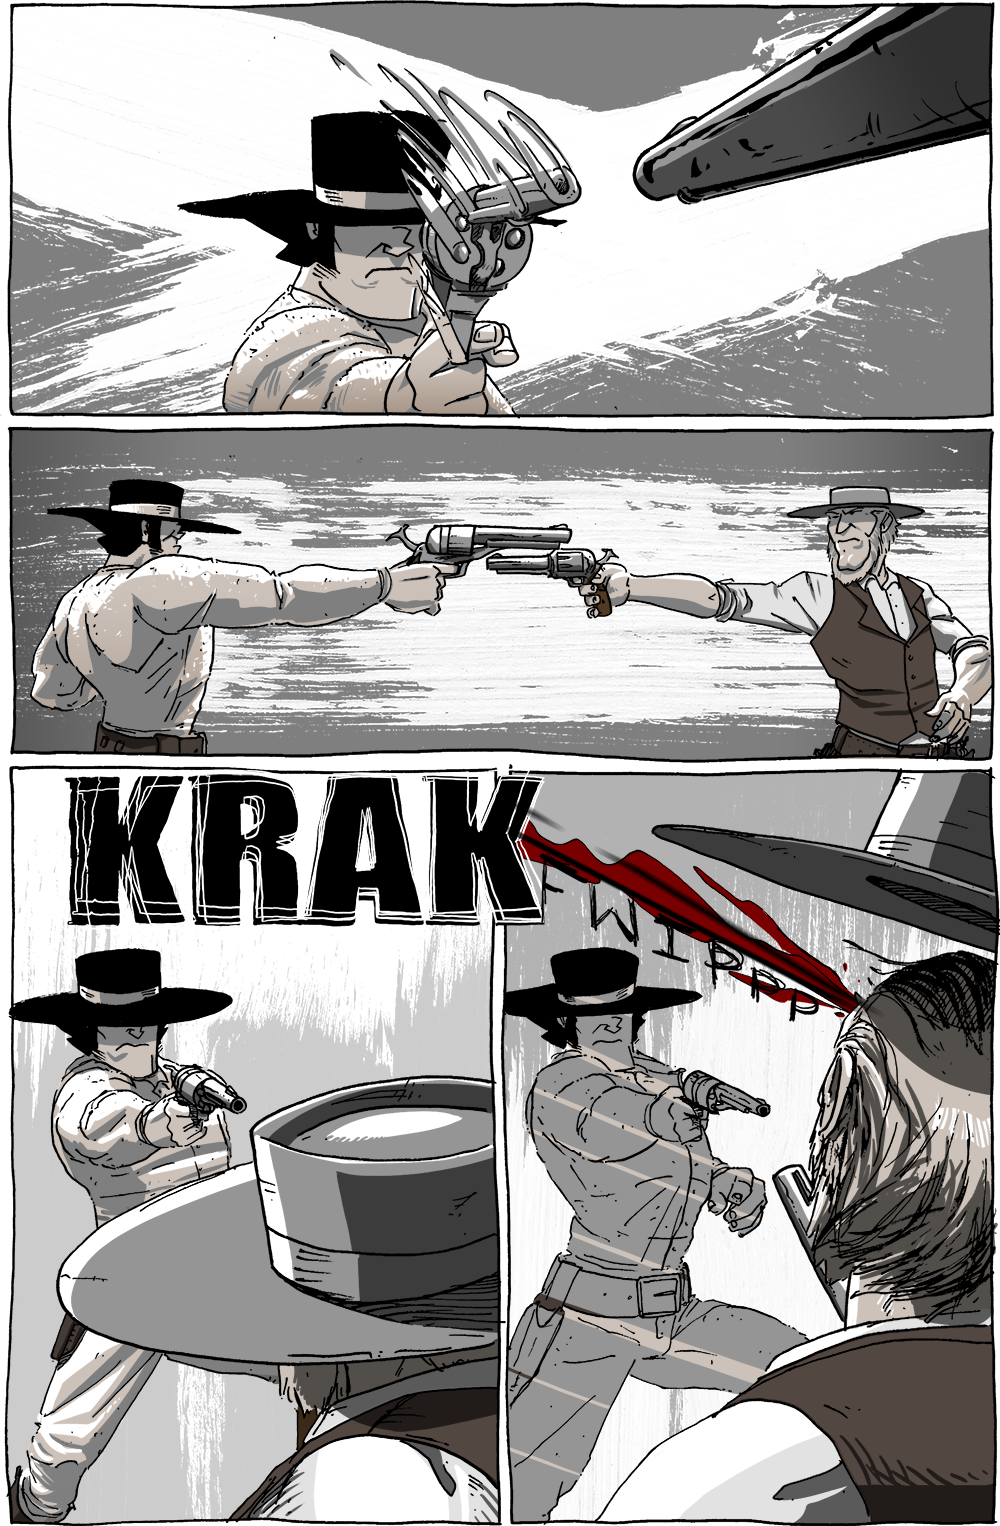 KRAK kills.